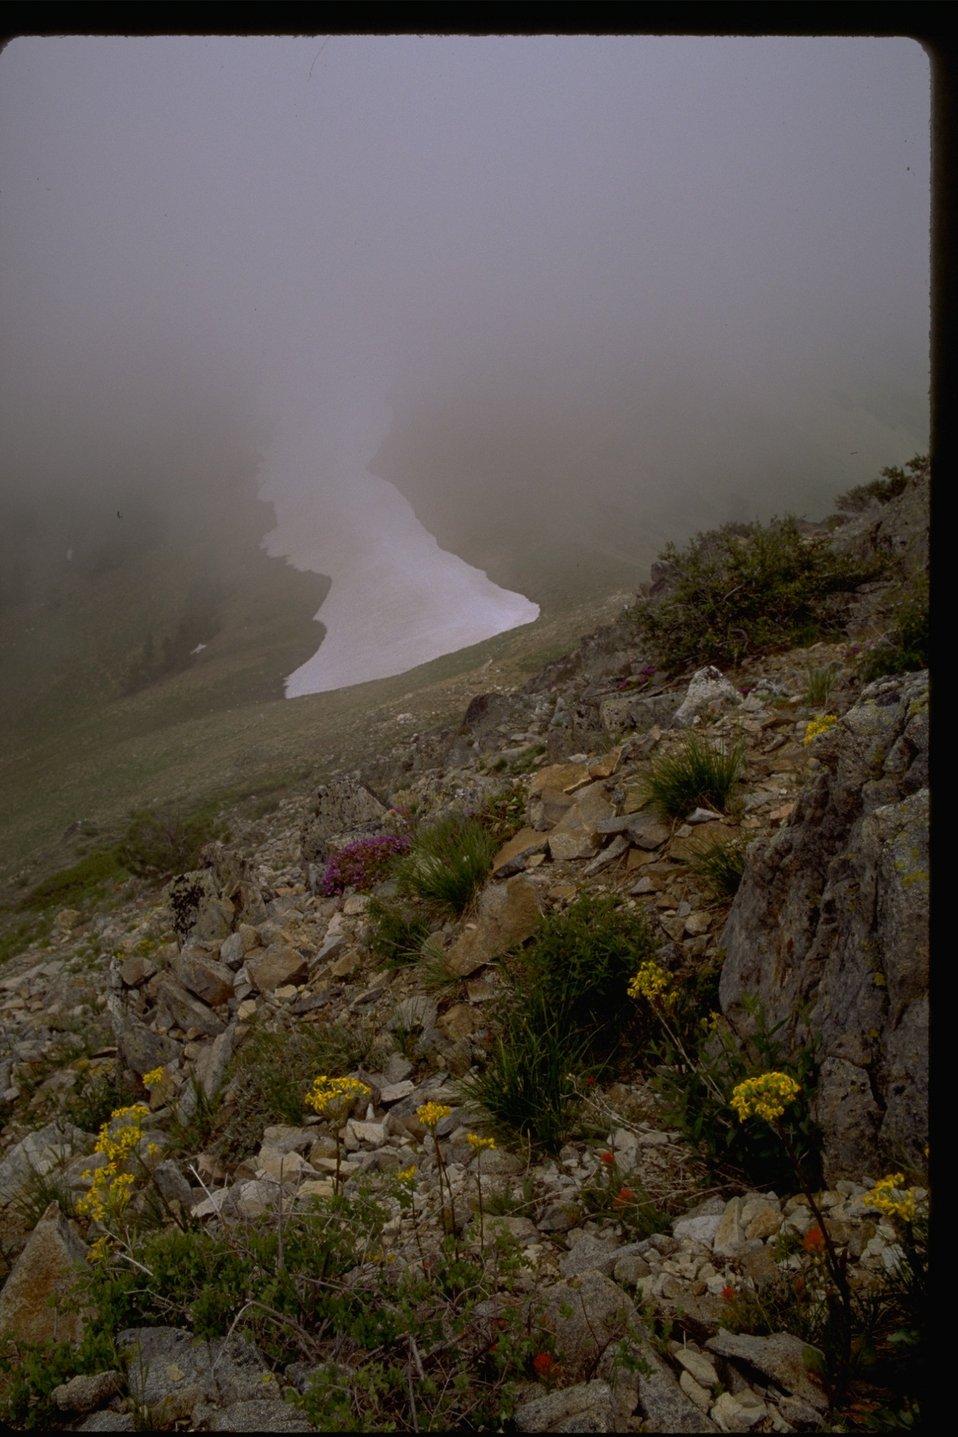 Flowers on a foggy day at Dutchman Peak.